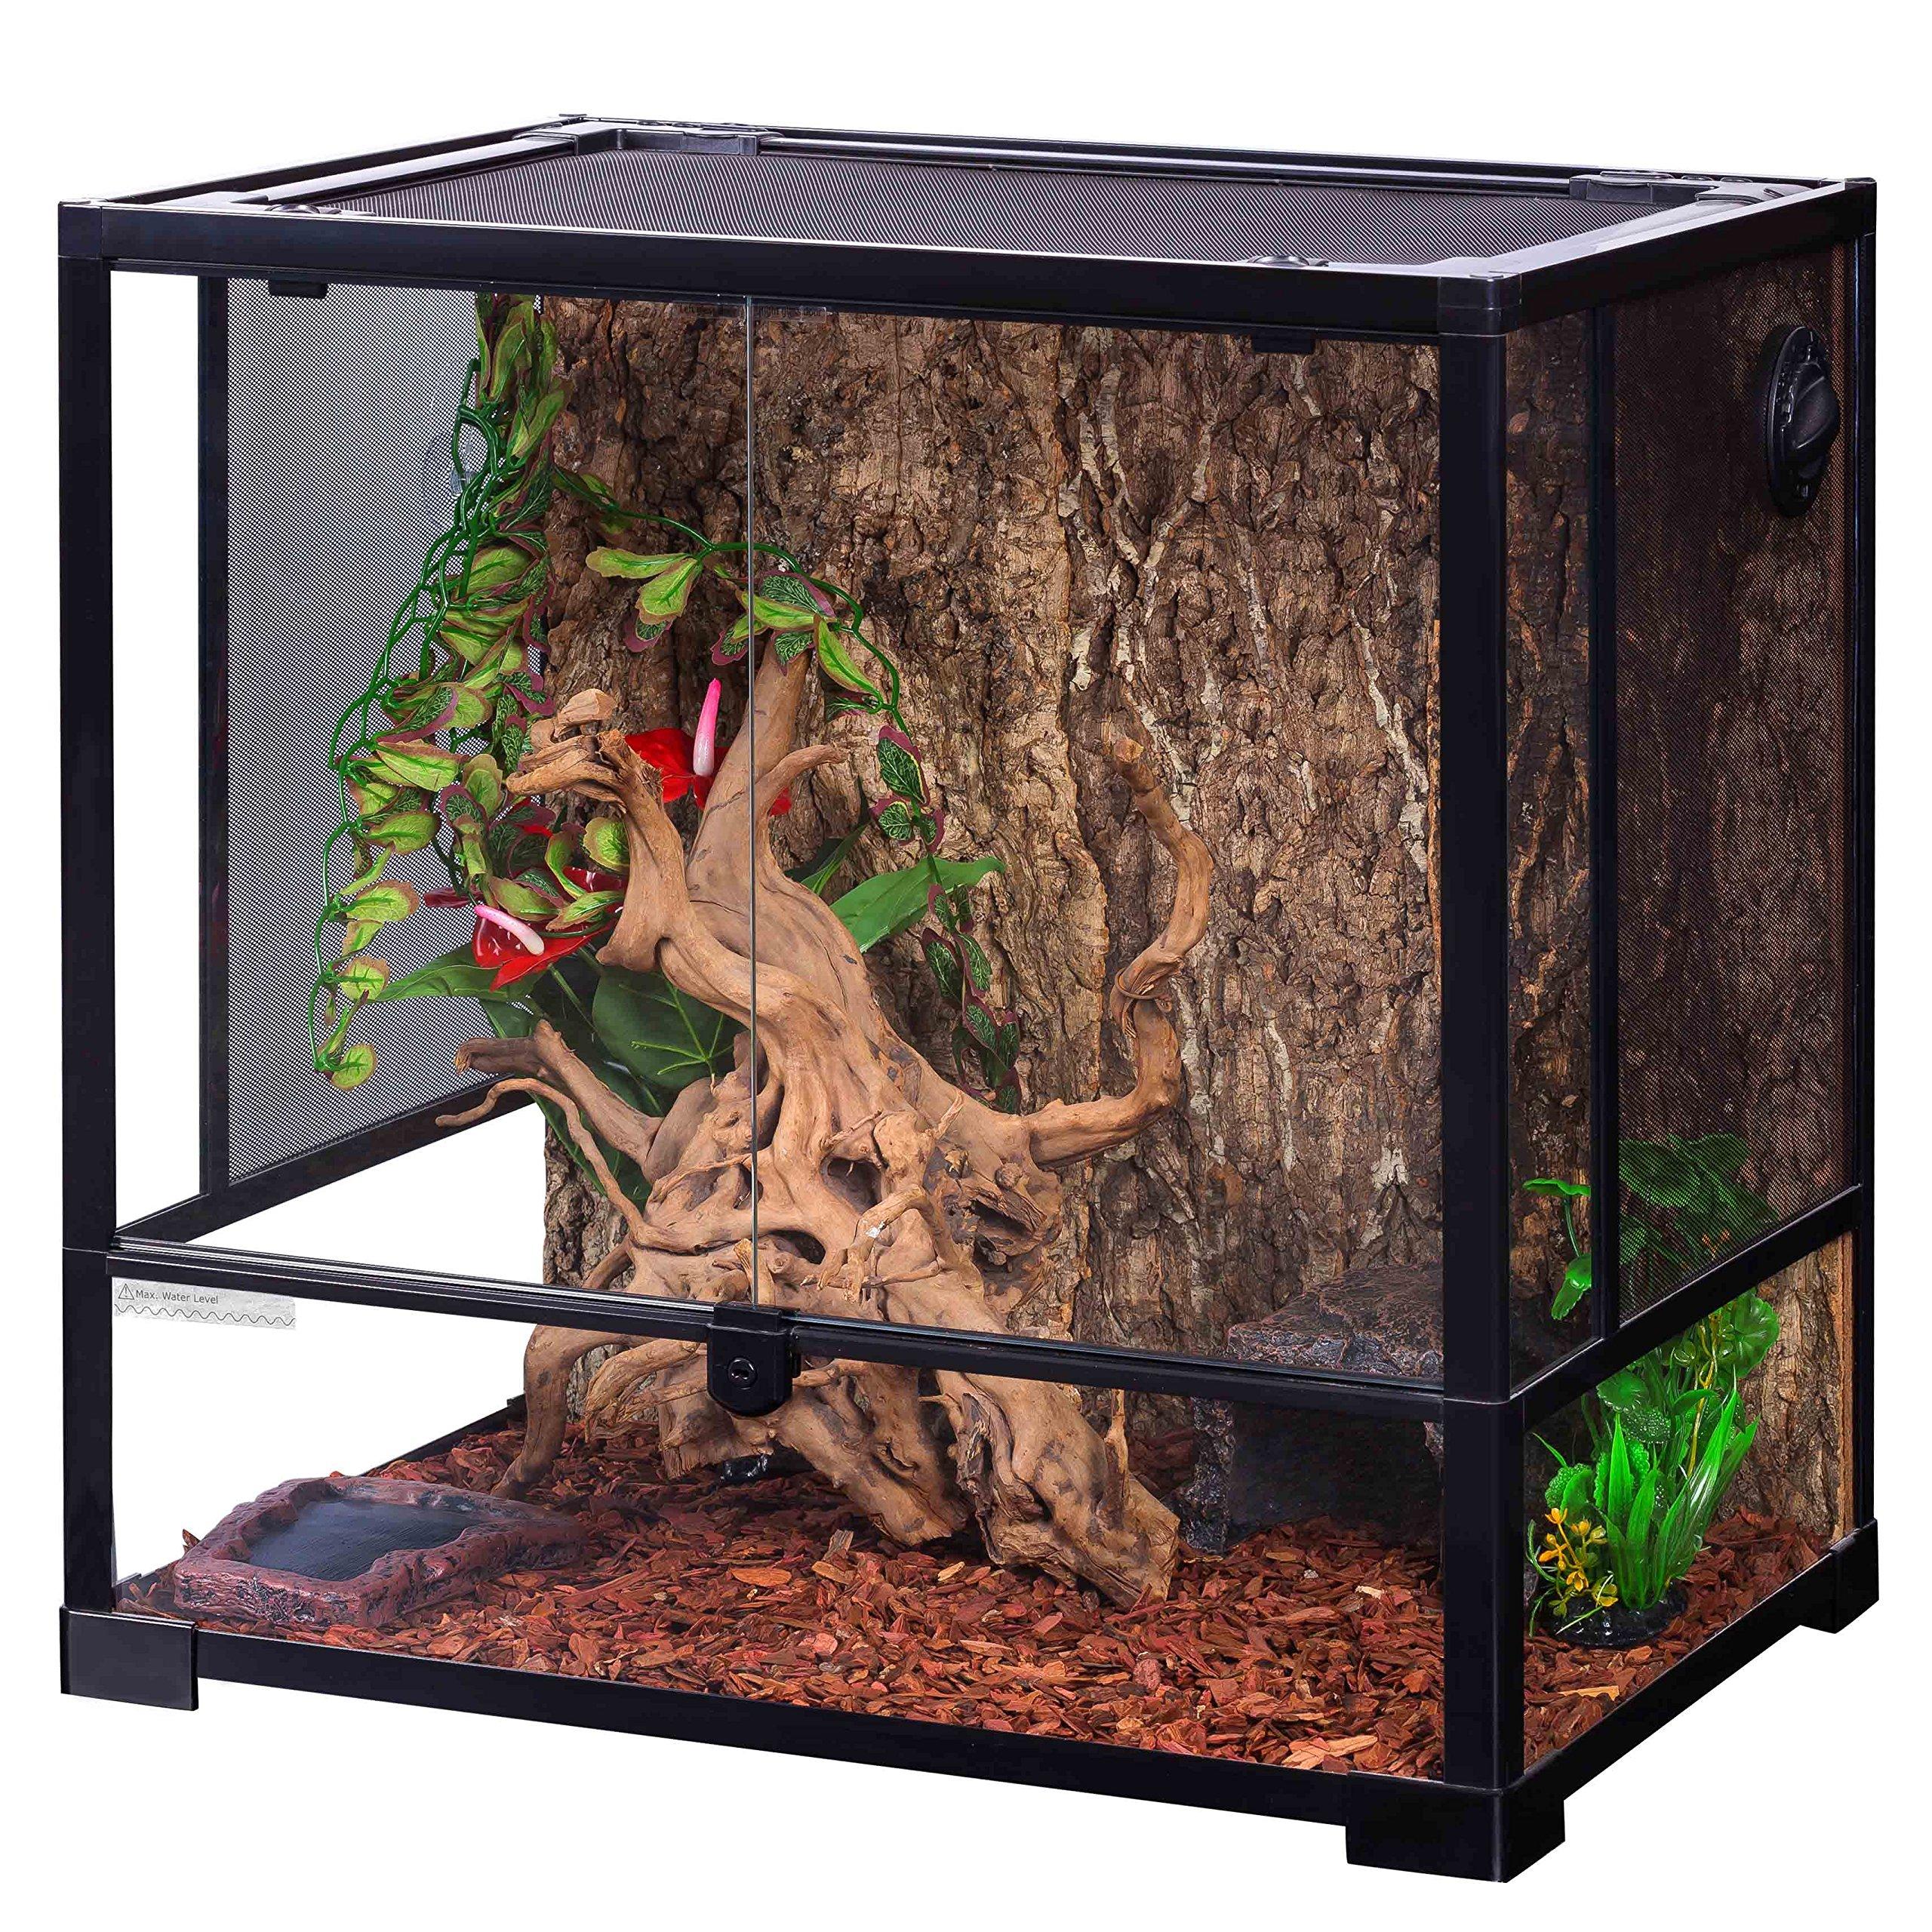 Oiibo Knock Down Glass Reptile Terrarium 24x18x24 Inch (Medium, Tall 24'' x 18'' x 24'')